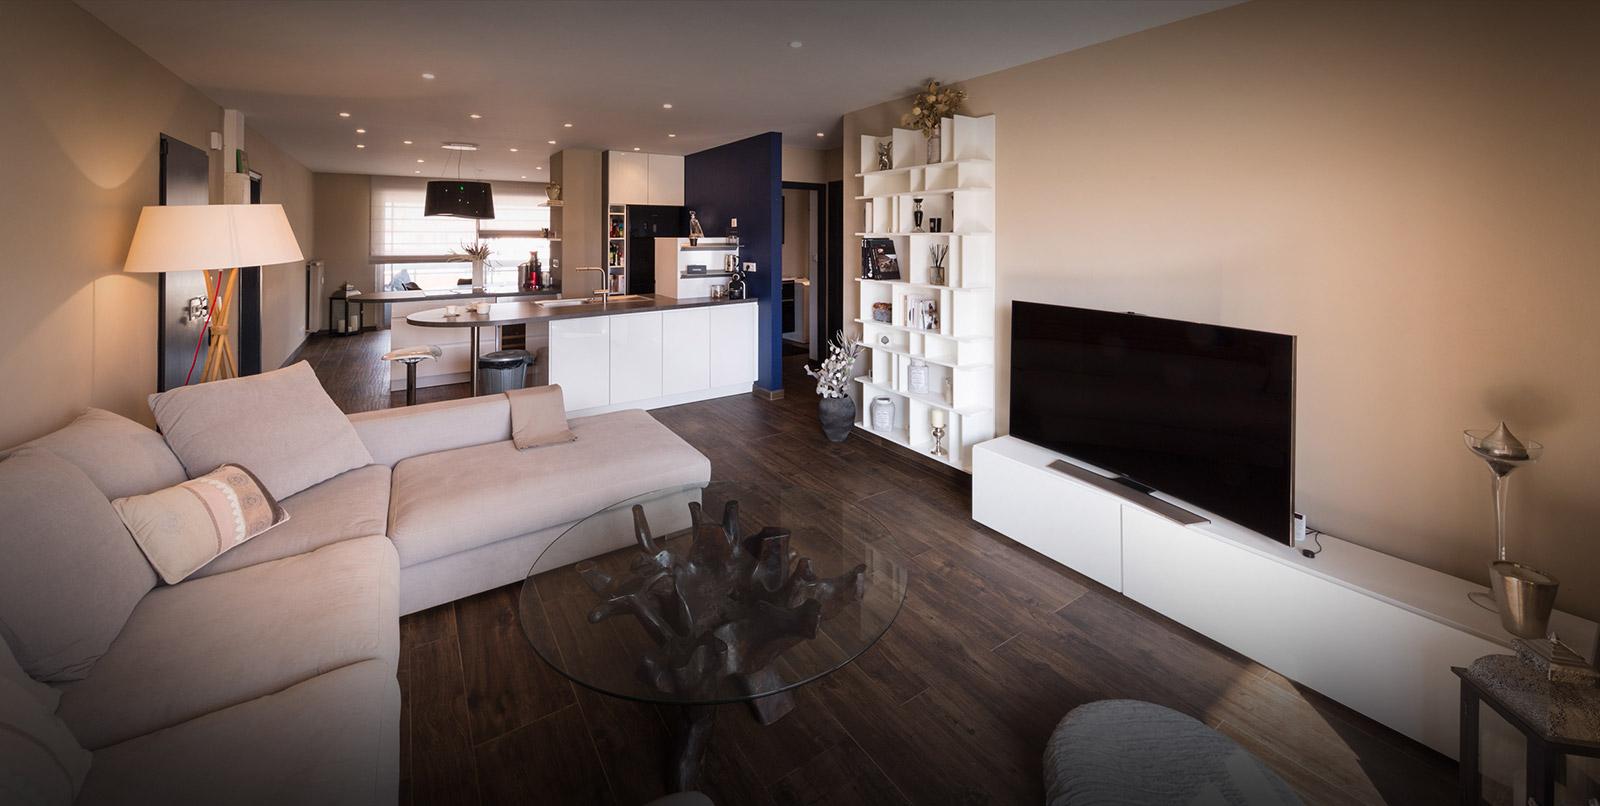 christiane schmit d coratrice d 39 int rieur valeurdeco. Black Bedroom Furniture Sets. Home Design Ideas